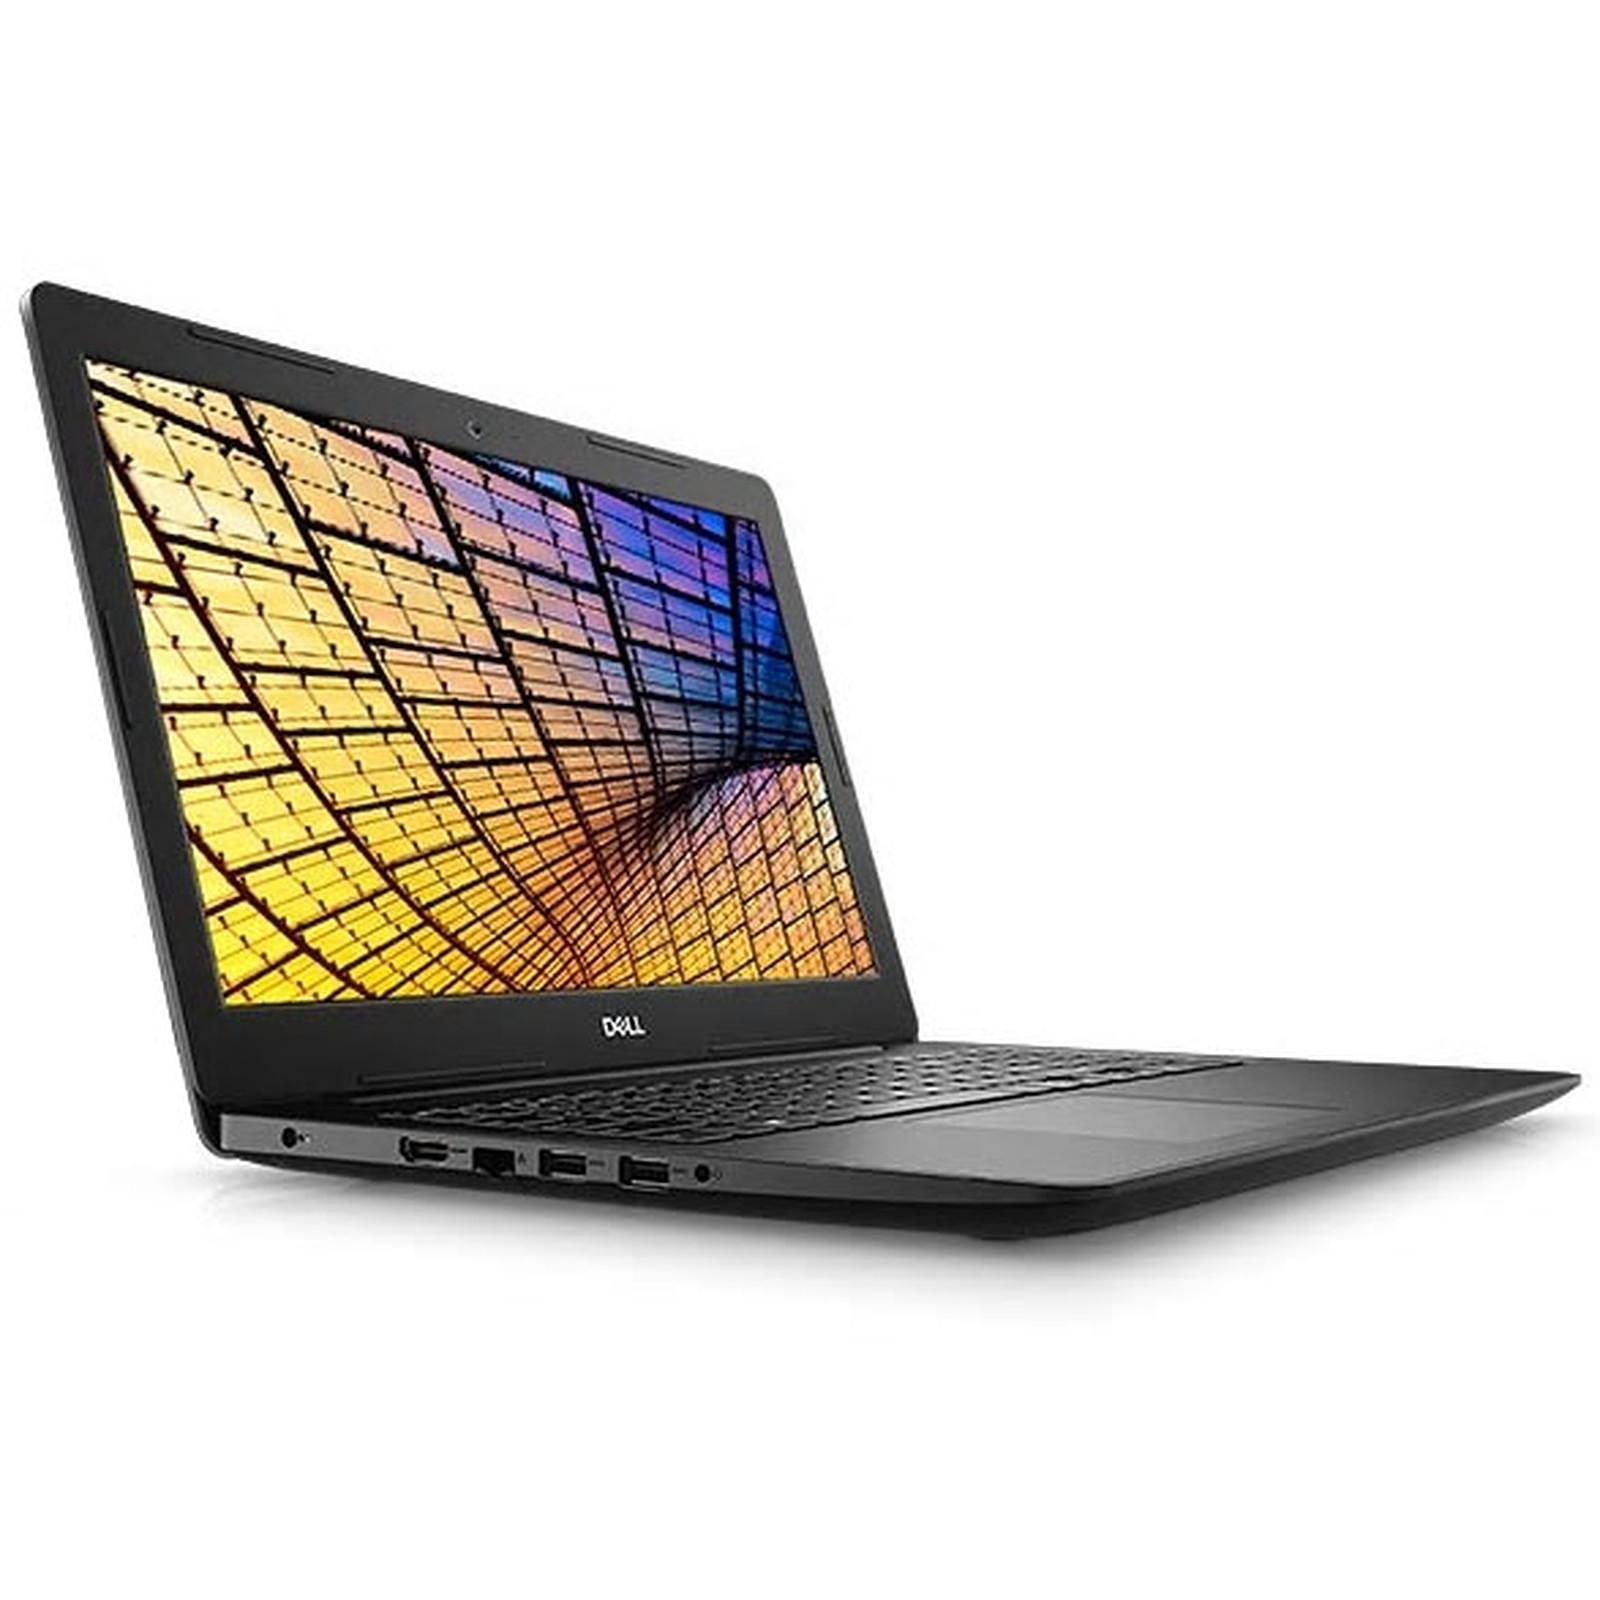 Dell Inspiron 15 3583 (WFJPW)